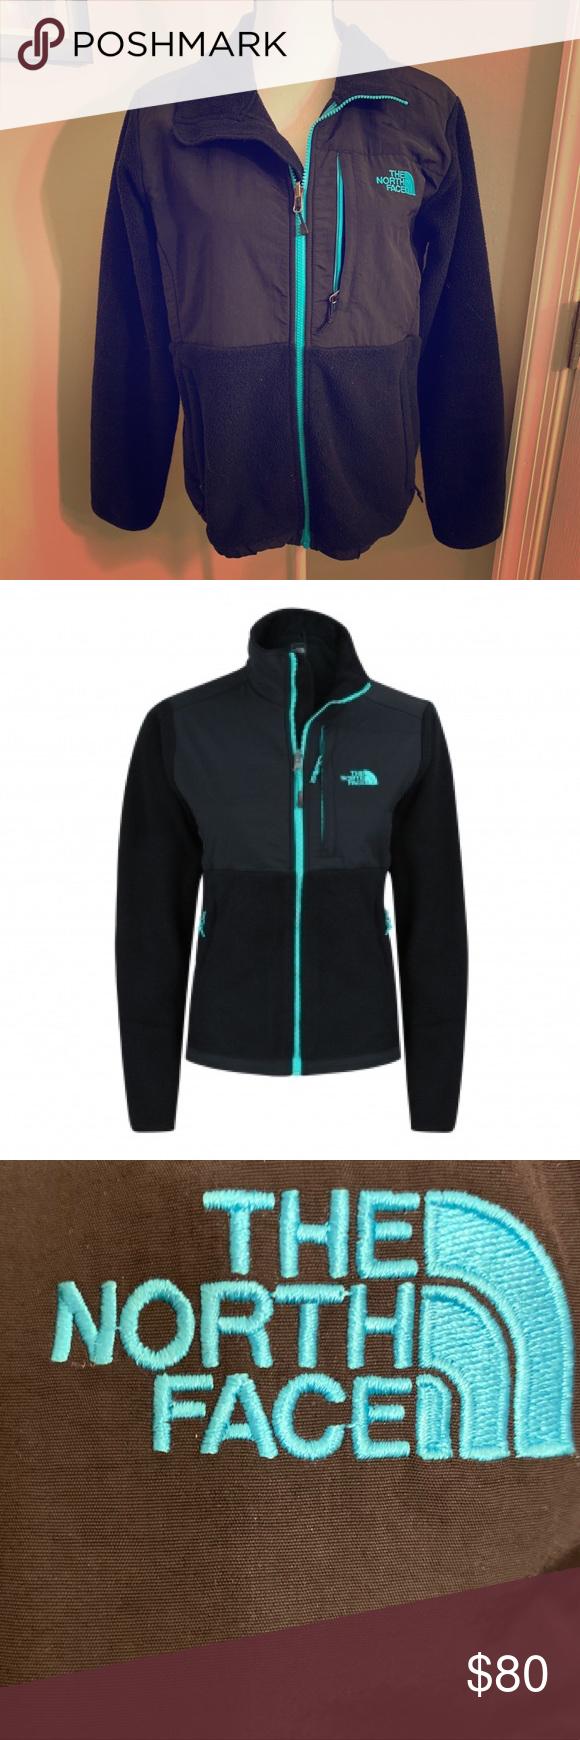 North Face Denali Fleece Black And Blue Jacket Light Blue Jacket Blue Jacket Jackets [ 1740 x 580 Pixel ]